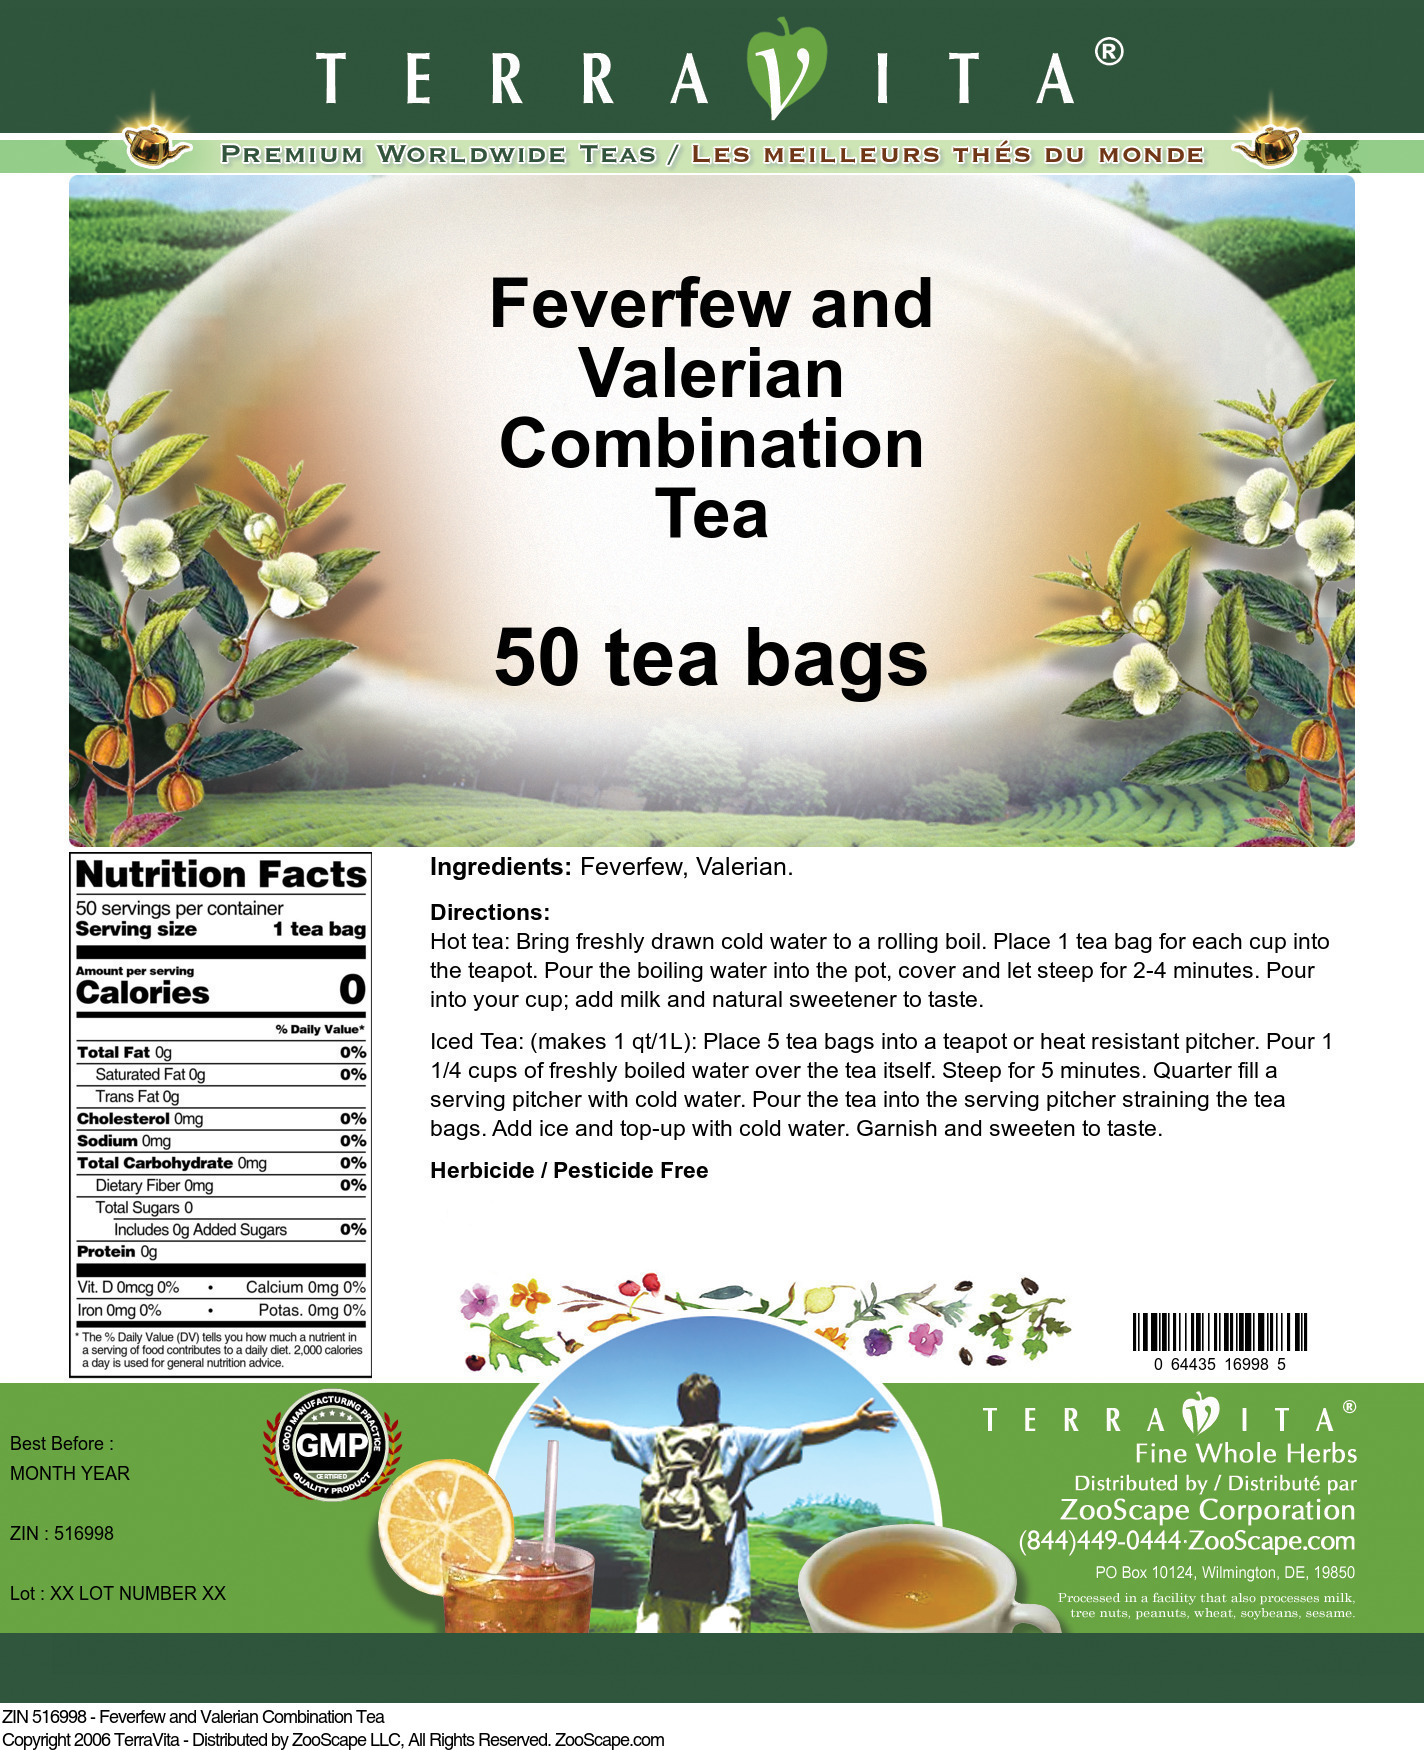 Feverfew and Valerian Combination Tea